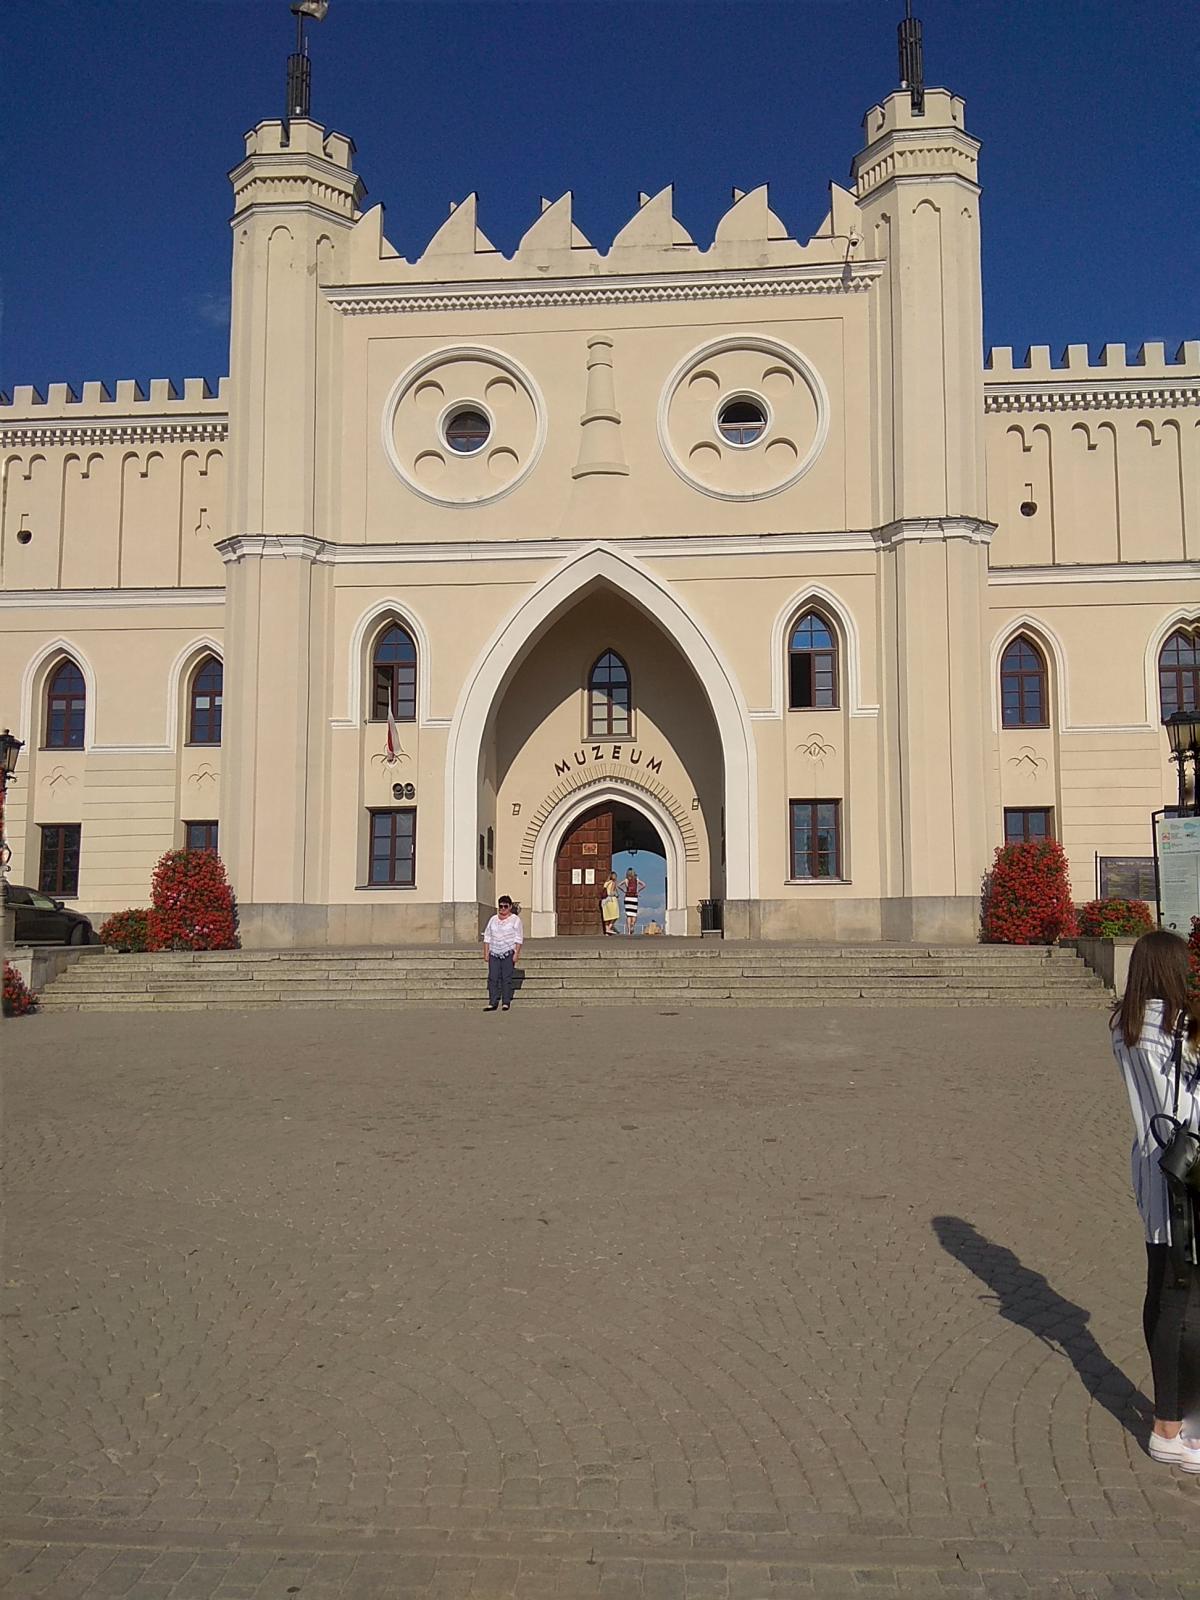 А вот и сам Люблинский замок / фото Варвара Вайс